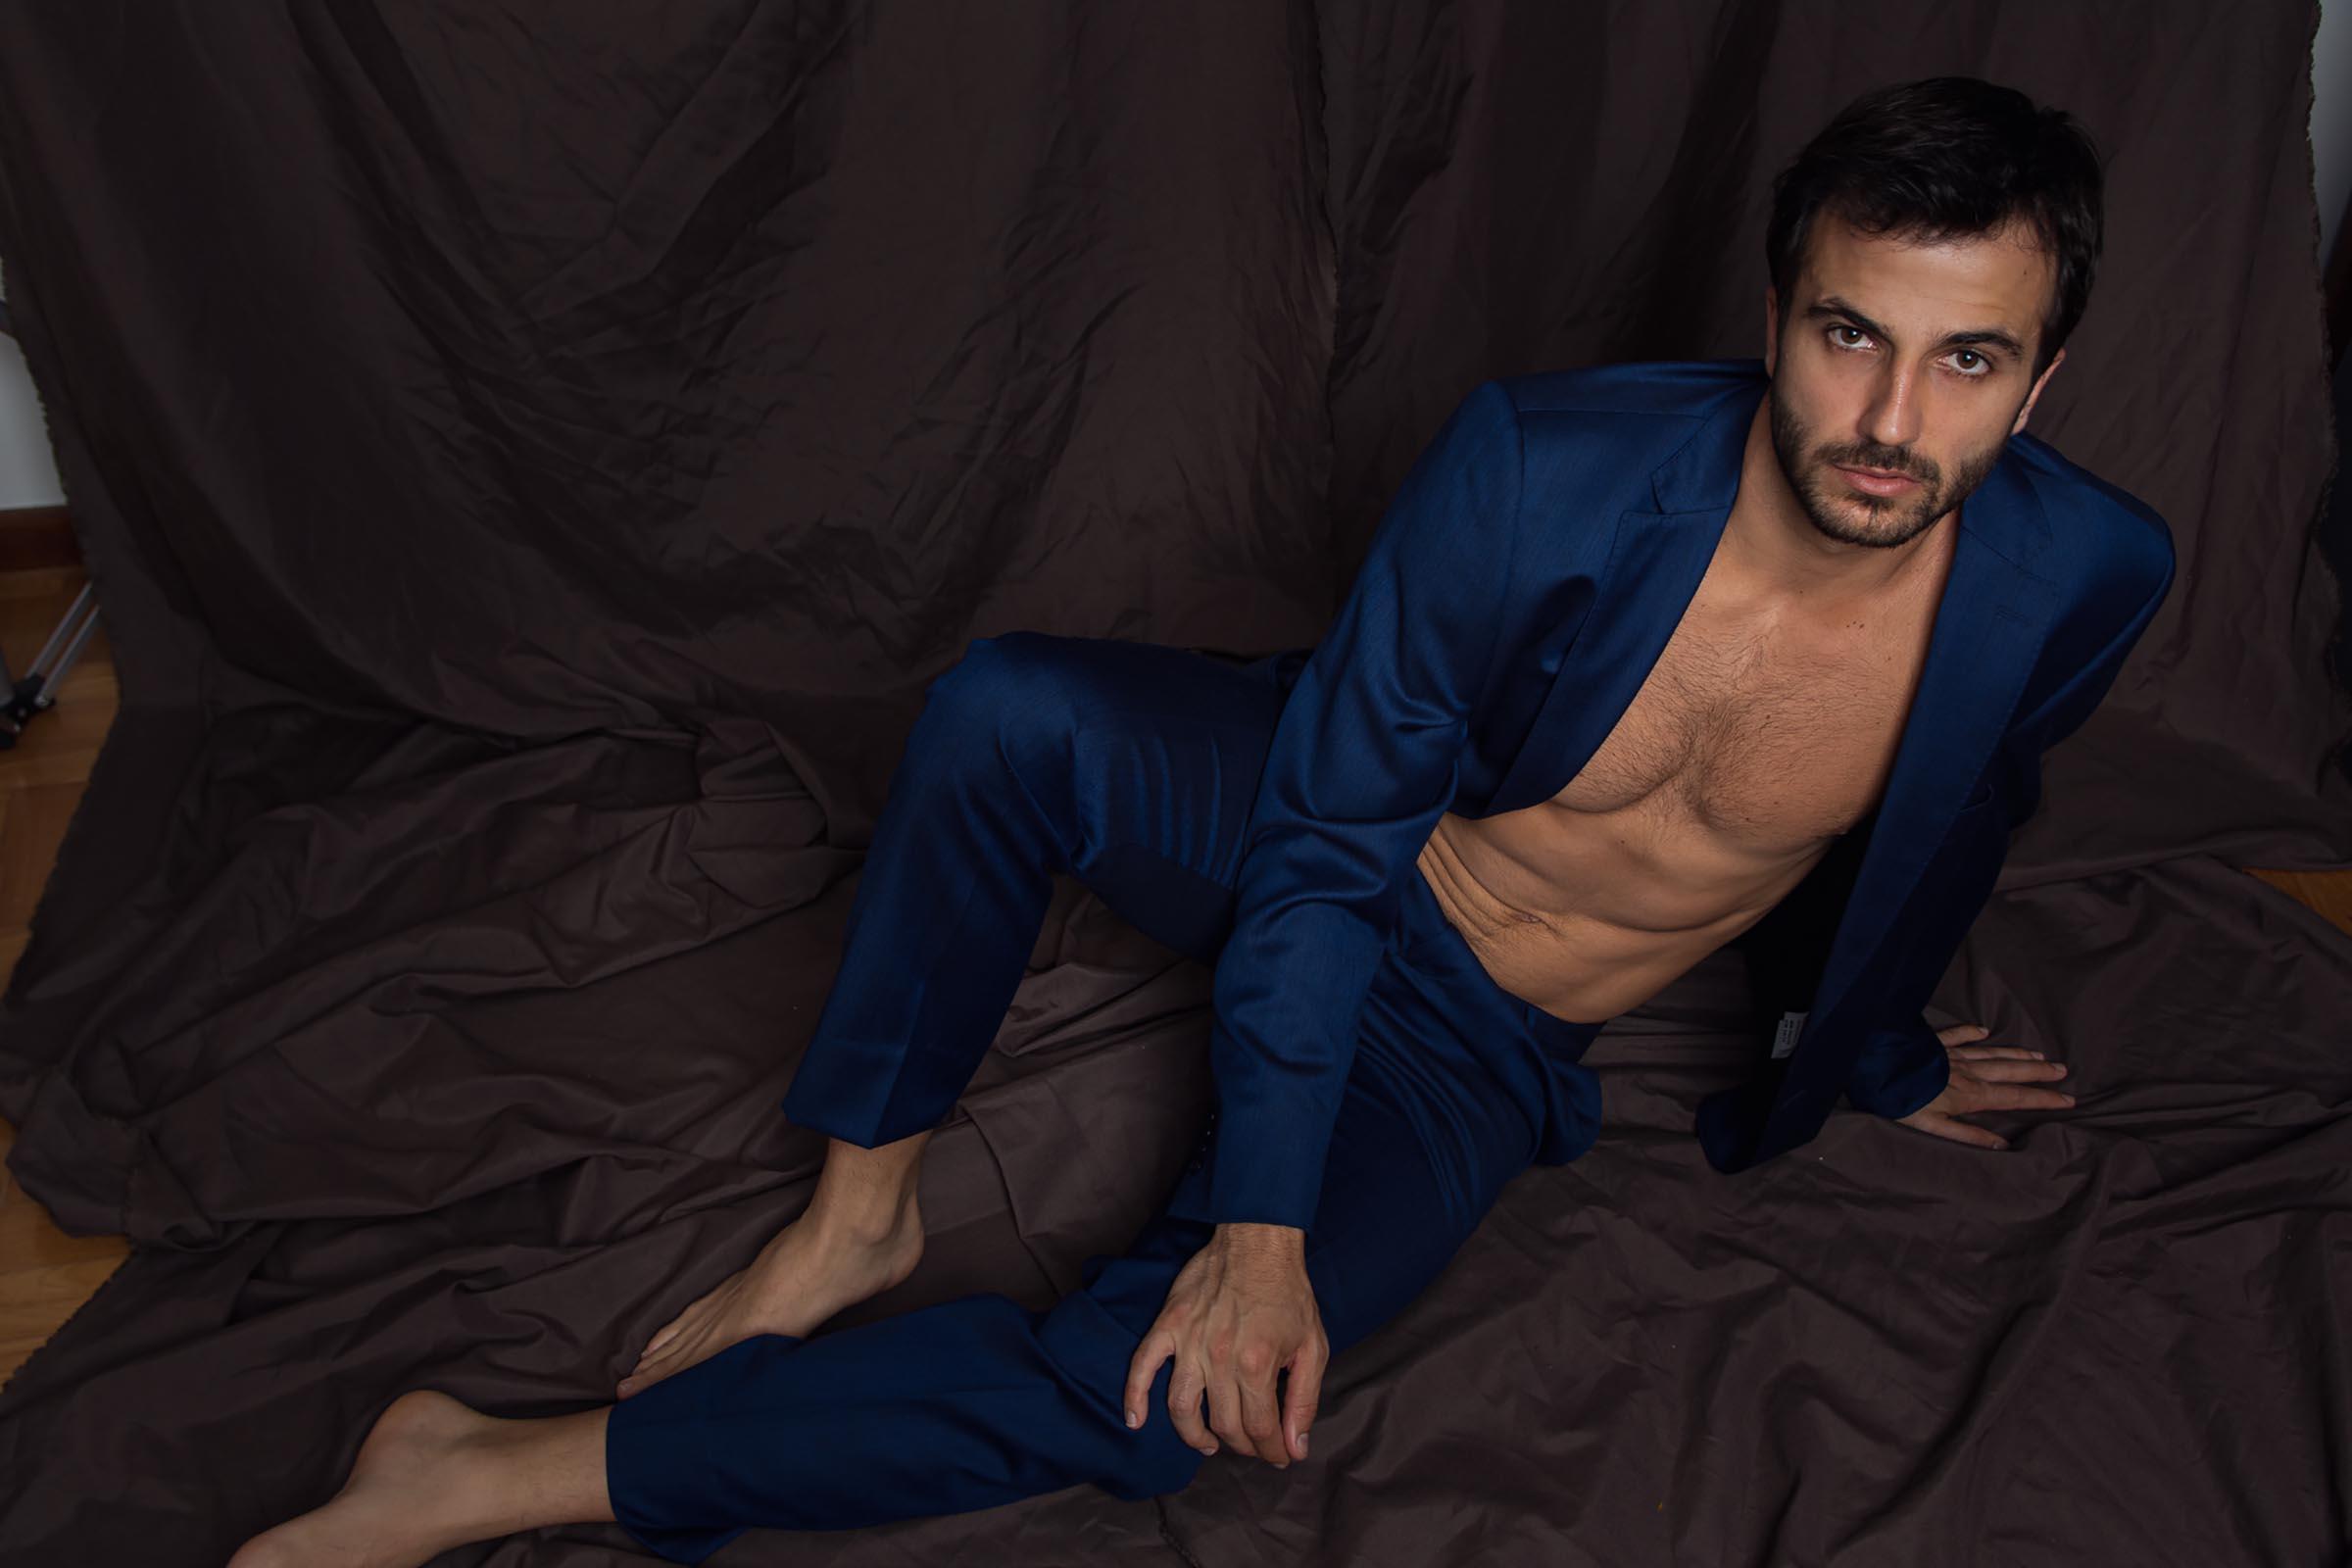 Bruno Bachur by Letícia Mansur for Brazilian Male Model